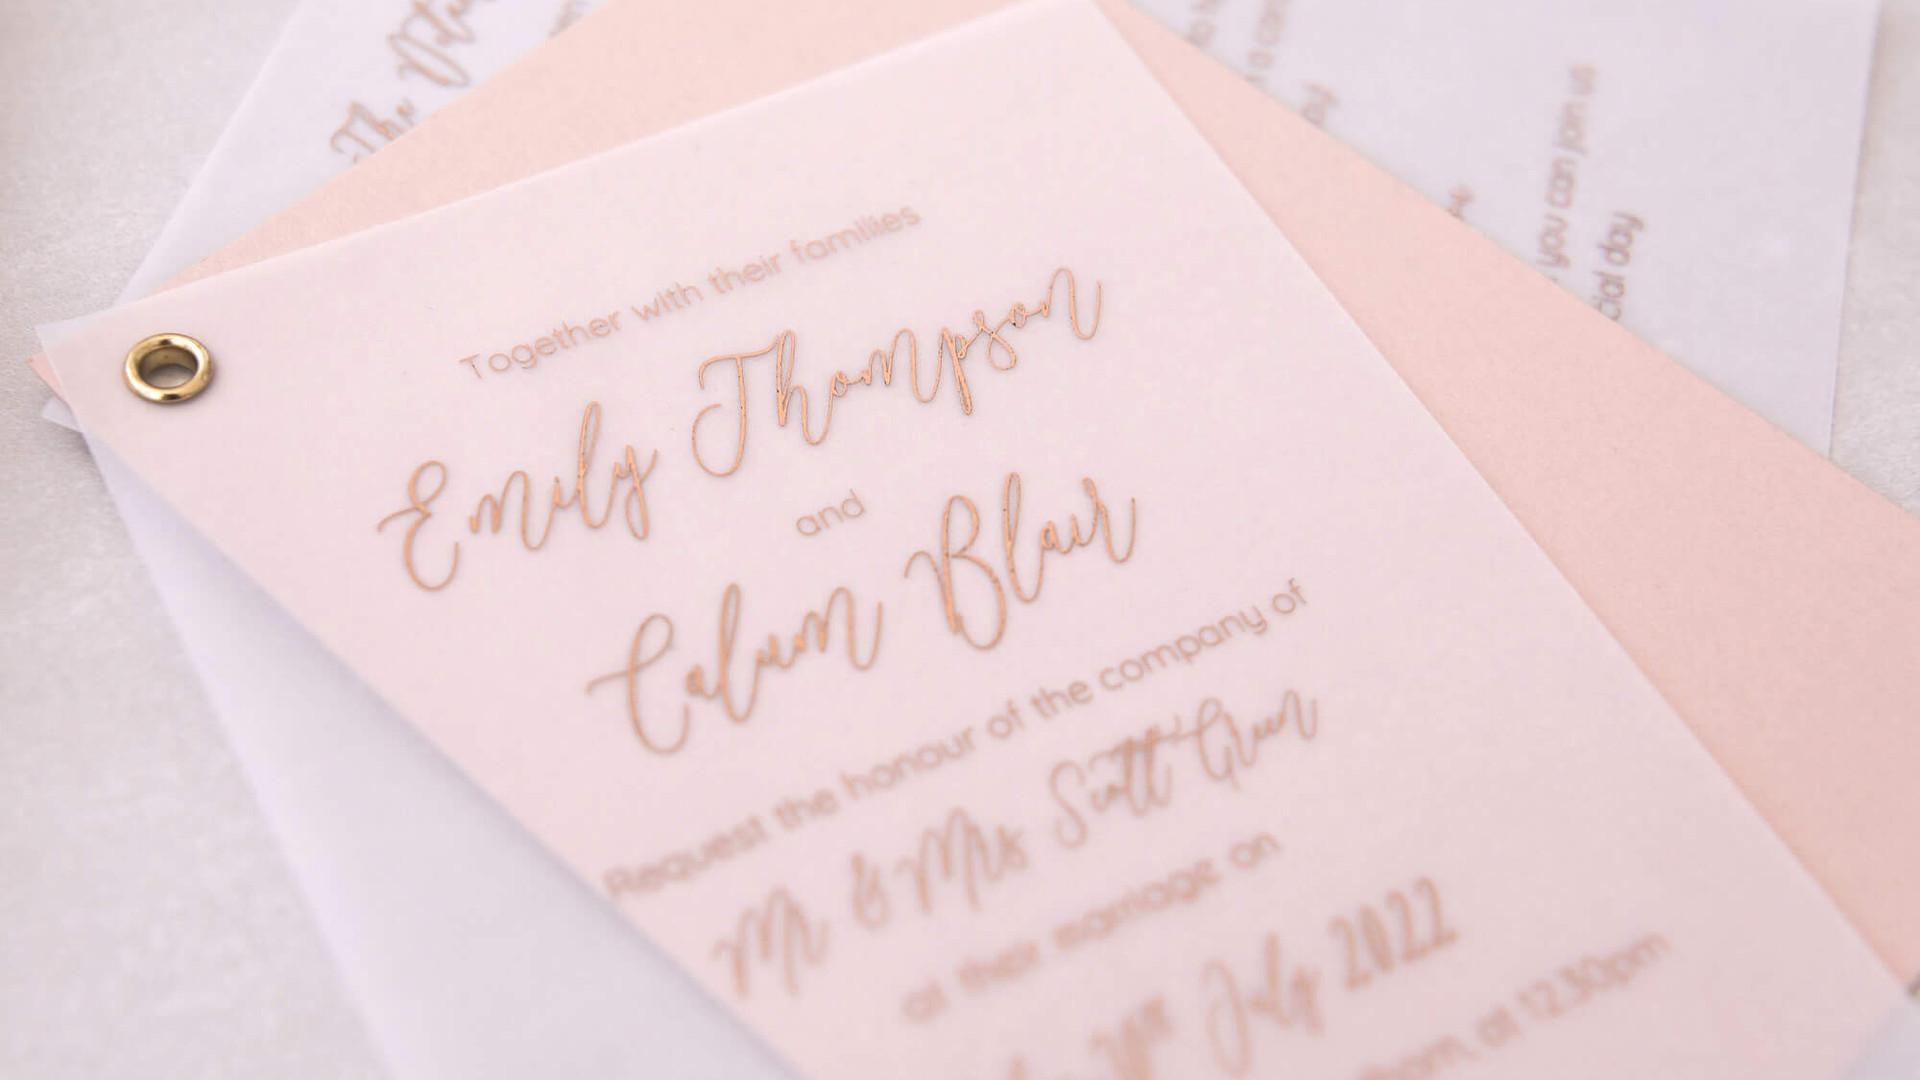 sarah swing vellum eylet luxury wedding invite gold digital foil edinburgh